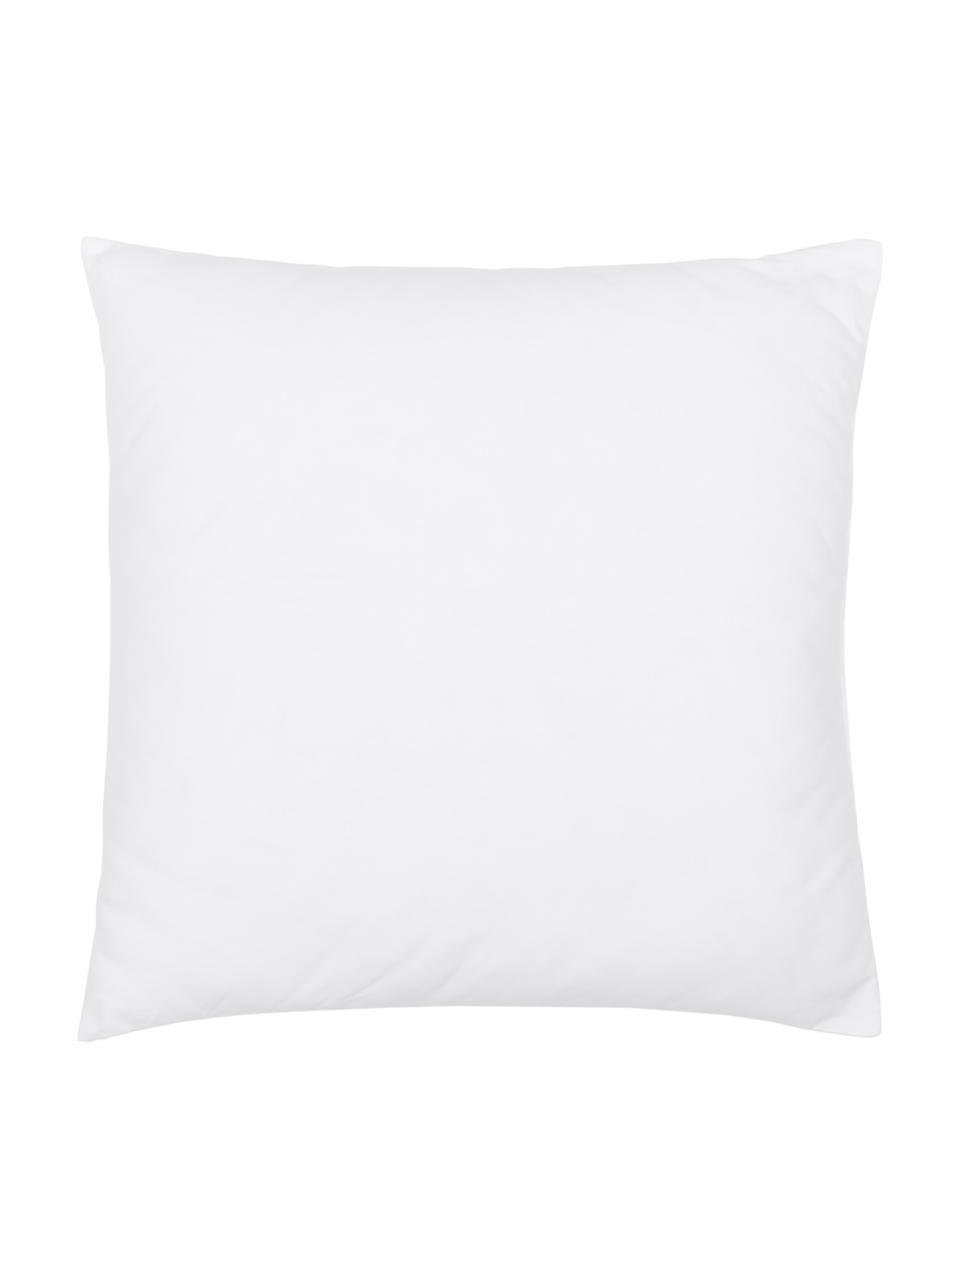 Imbottitura cuscino in microfibra Sia, 60 x 60 cm, Bianco, Larg. 60 x Lung. 60 cm